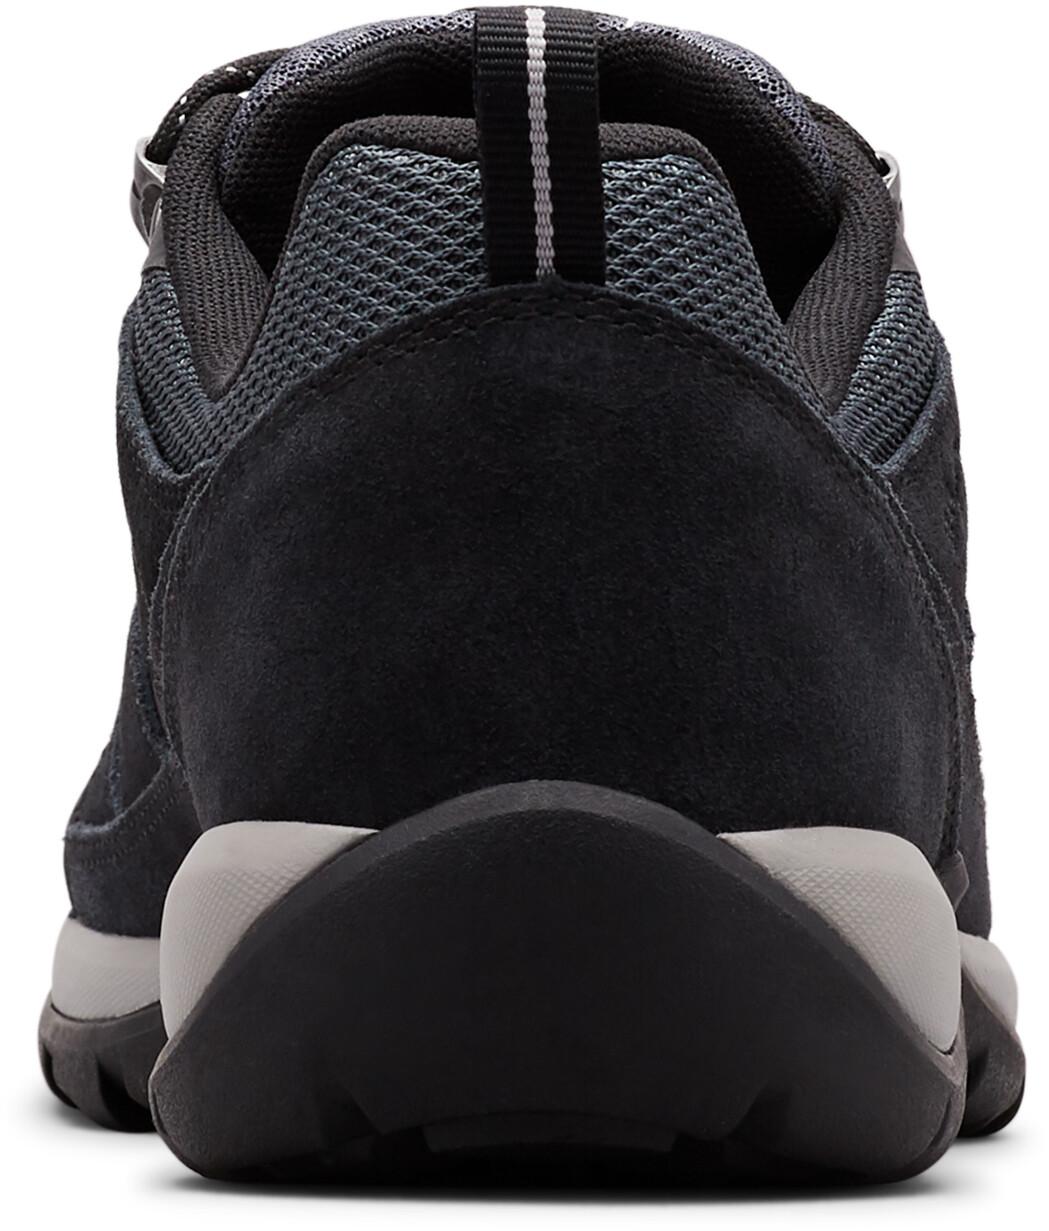 Columbia Redmond V2 Chaussures Homme, graphitecolumbia grey